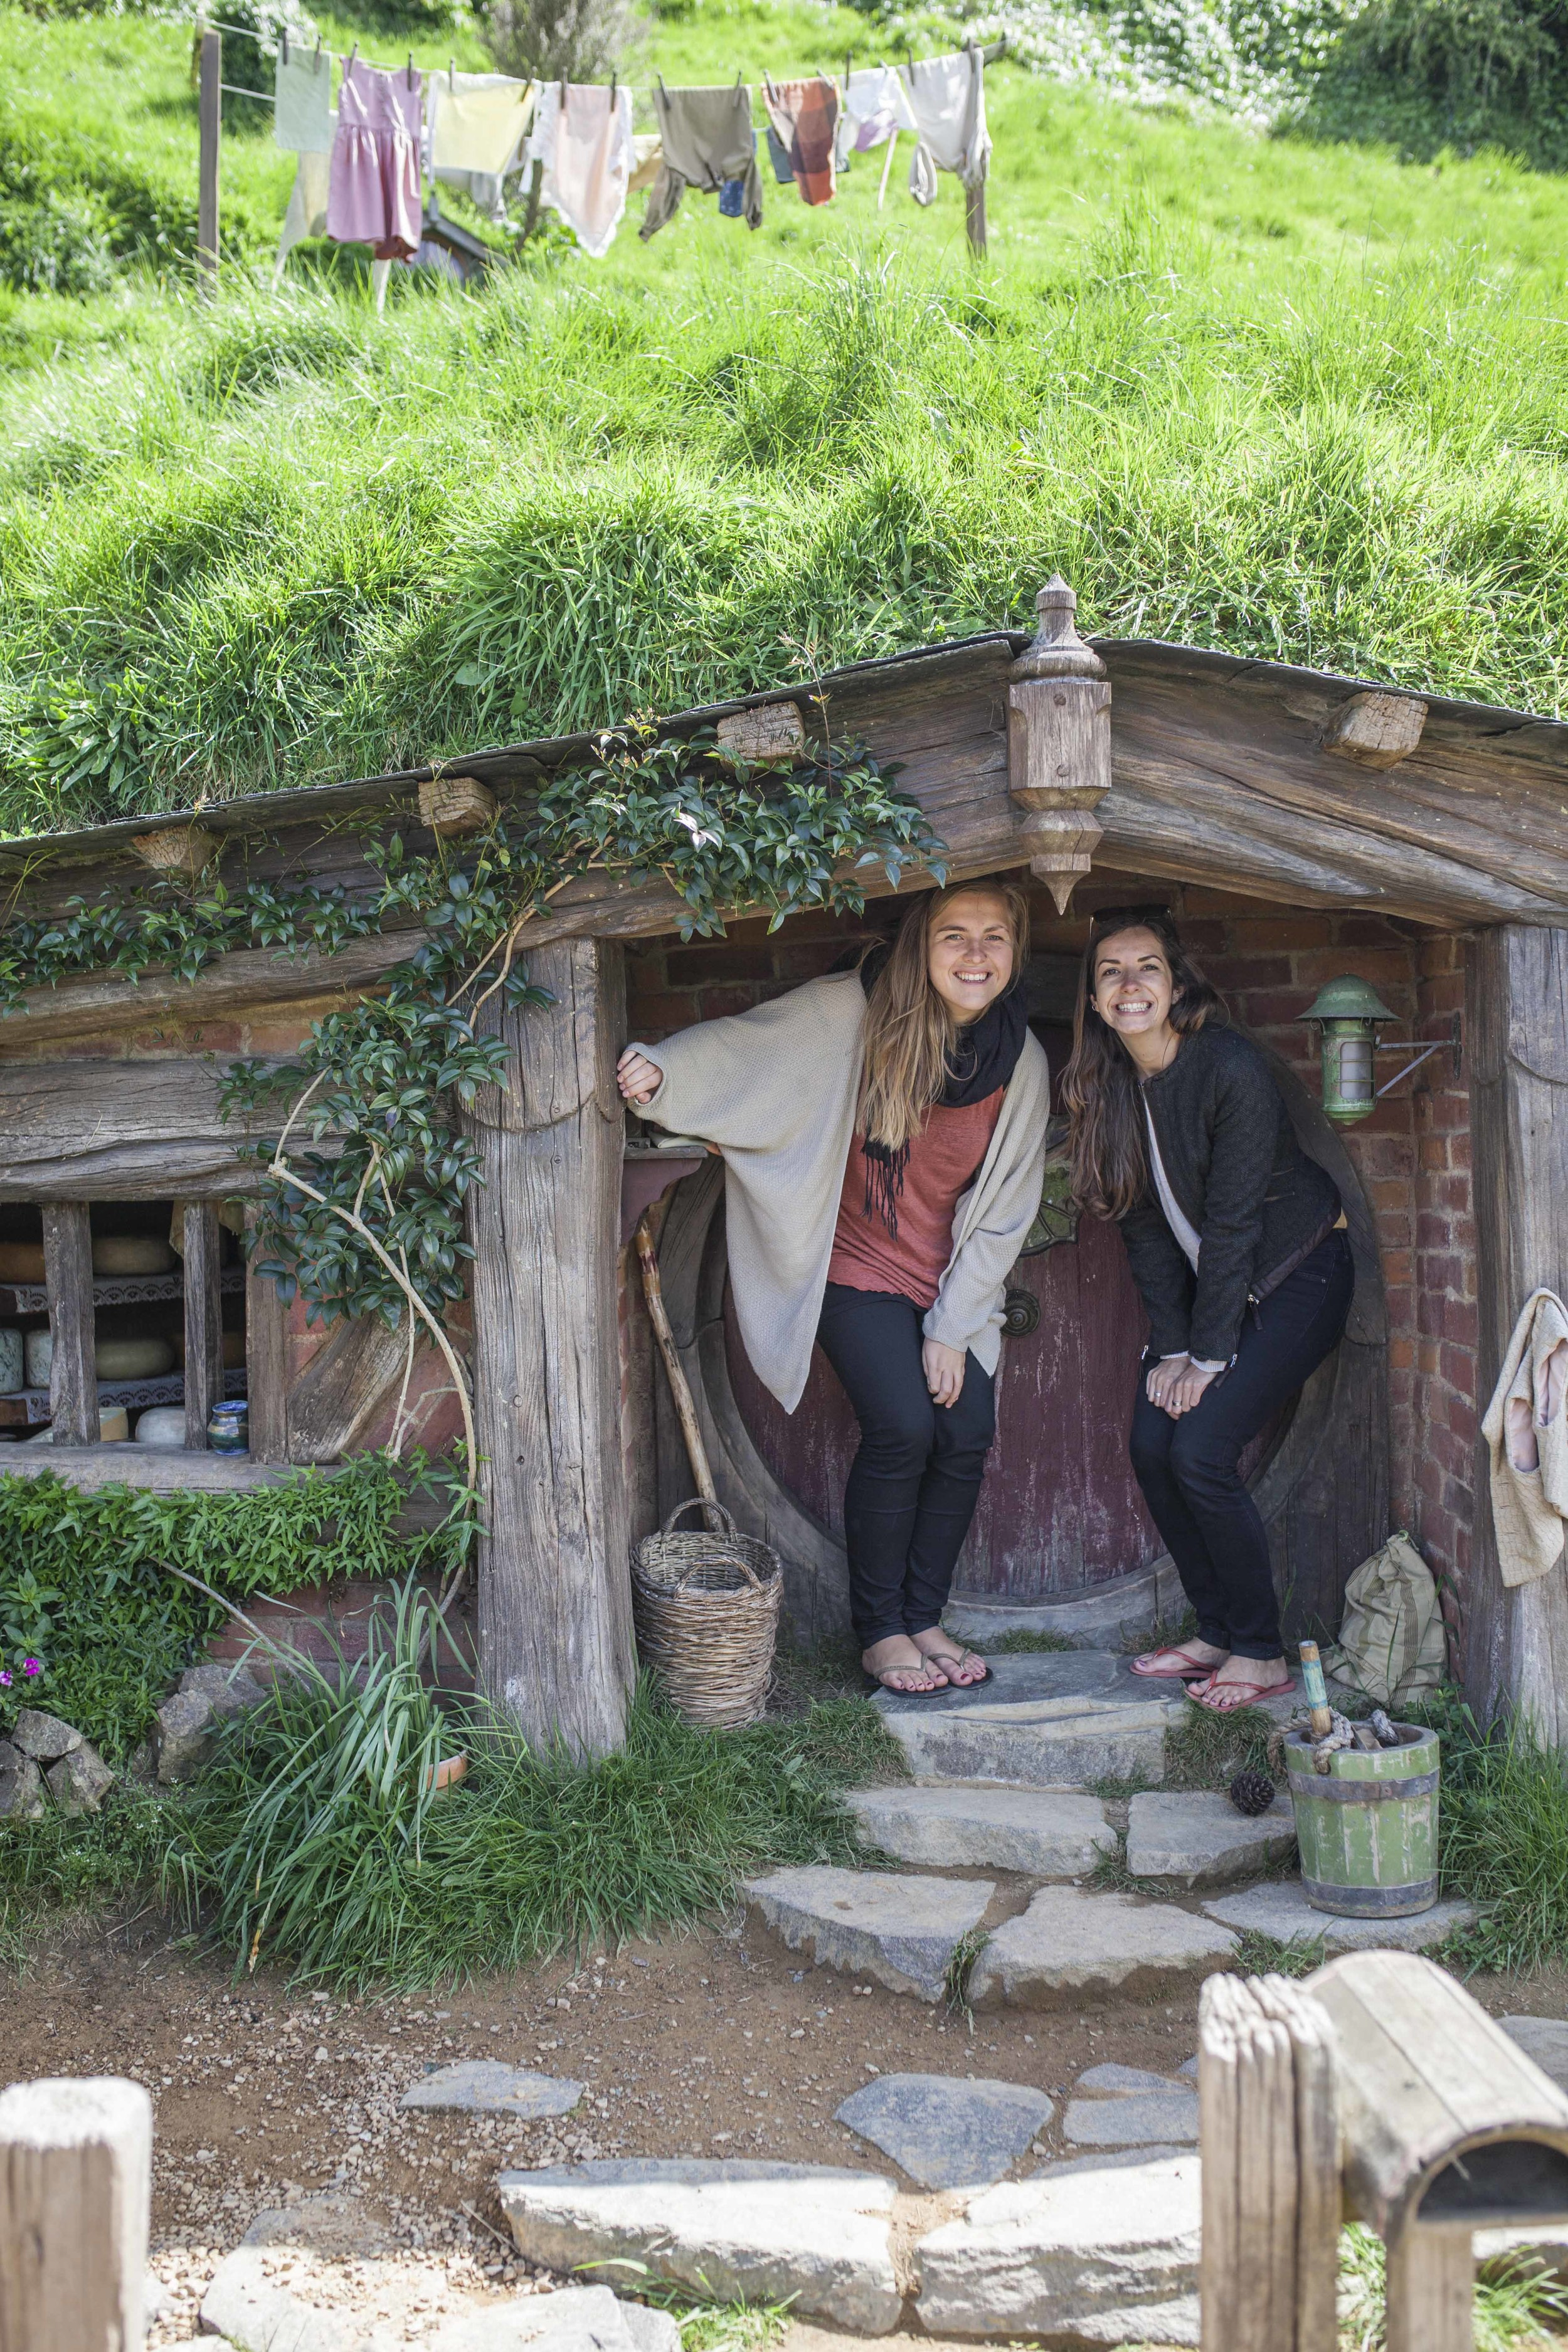 069Toronto Lifestyle Photographers -Hobbiton, New Zealand - Jono & Laynie Co.jpg